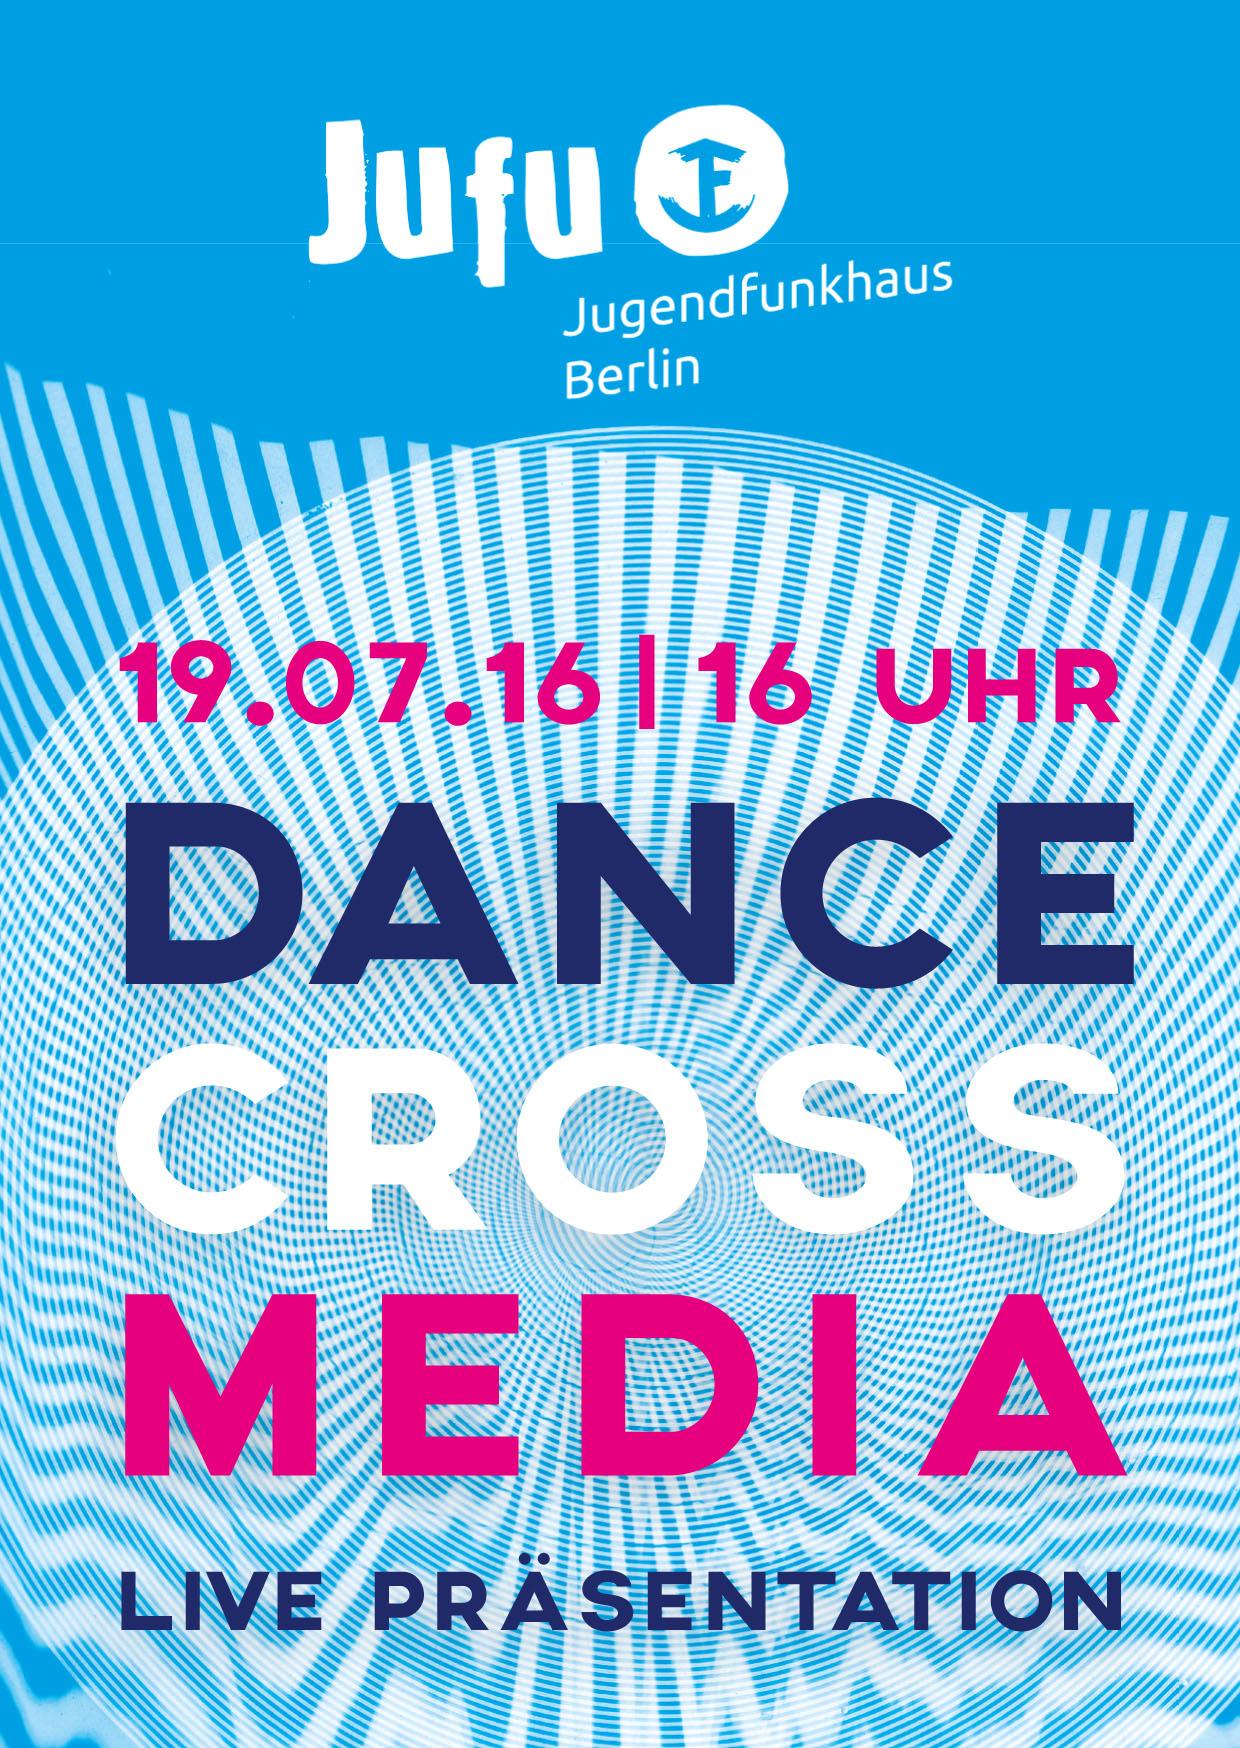 jufu-dance-cross-media-h